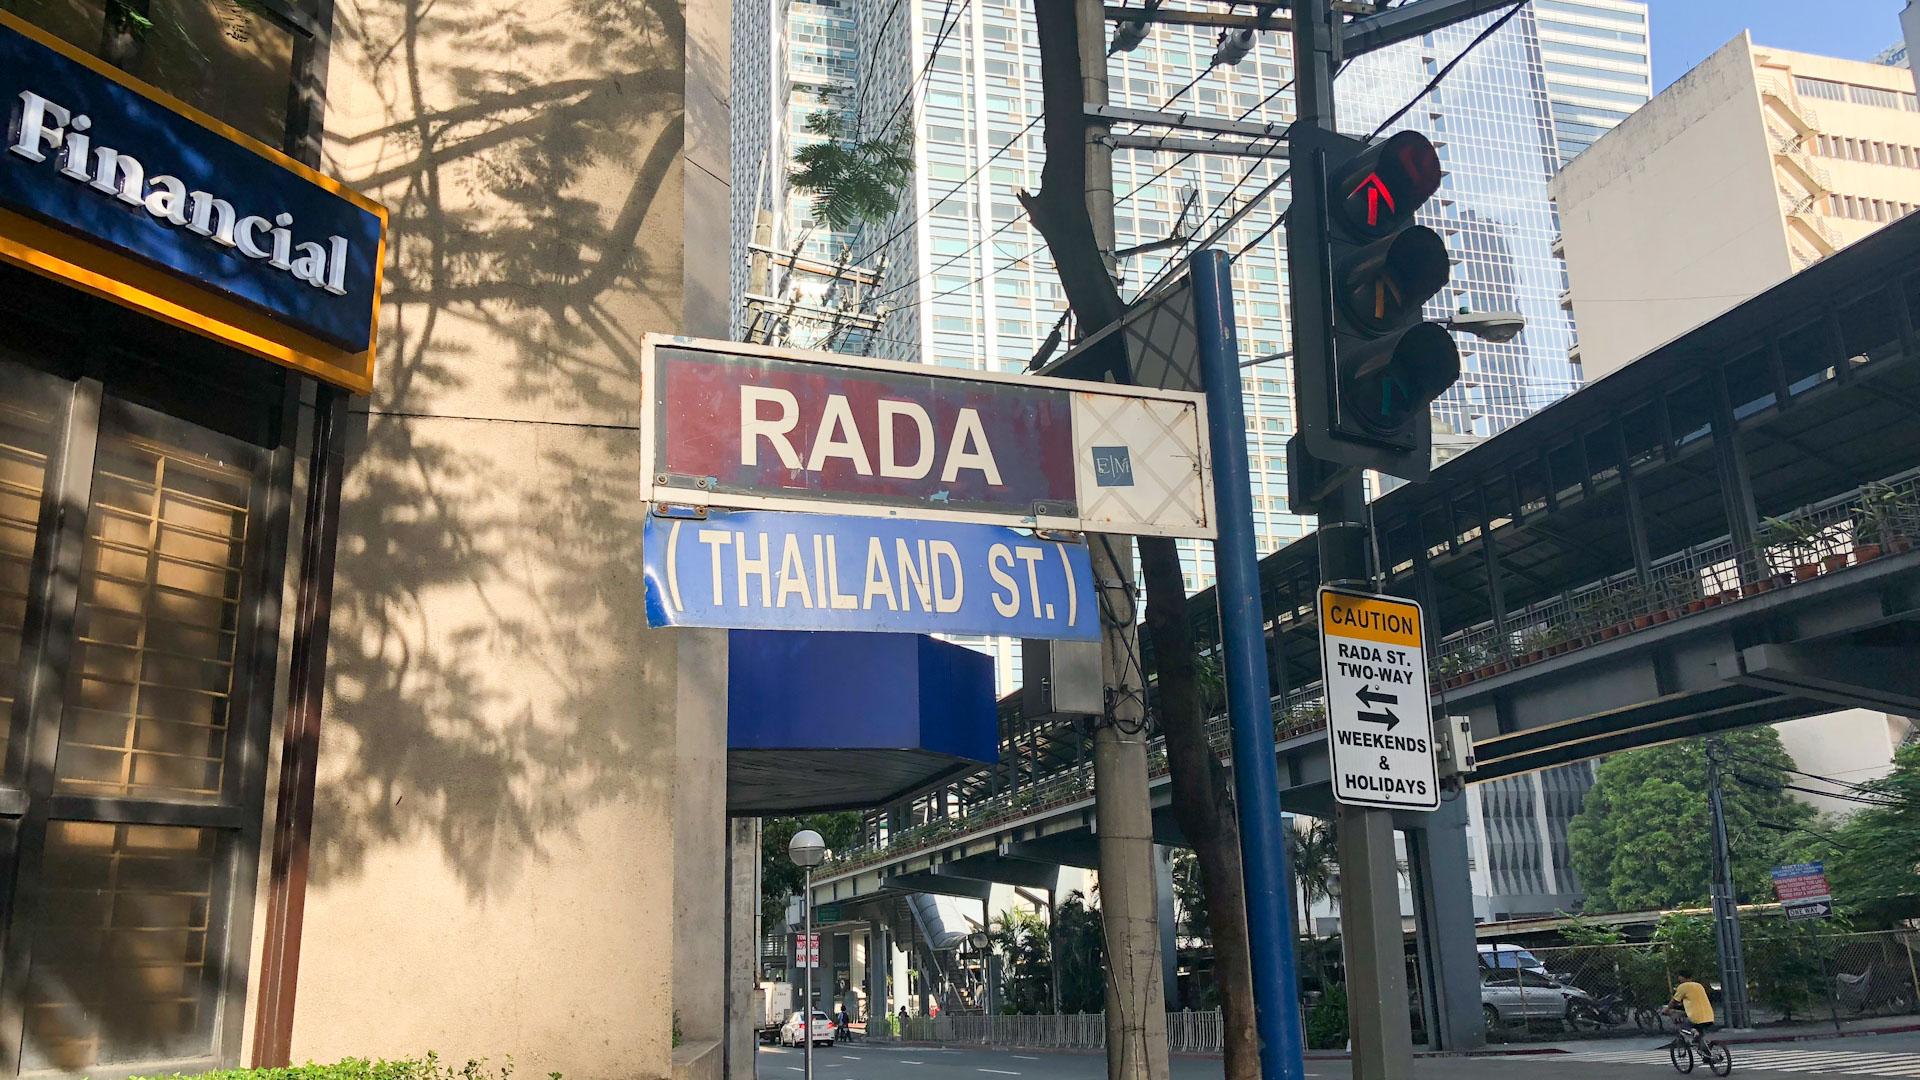 Royal Thai Embassy, Manila, Philippines - Makati - Rada Street (Thailand St.)